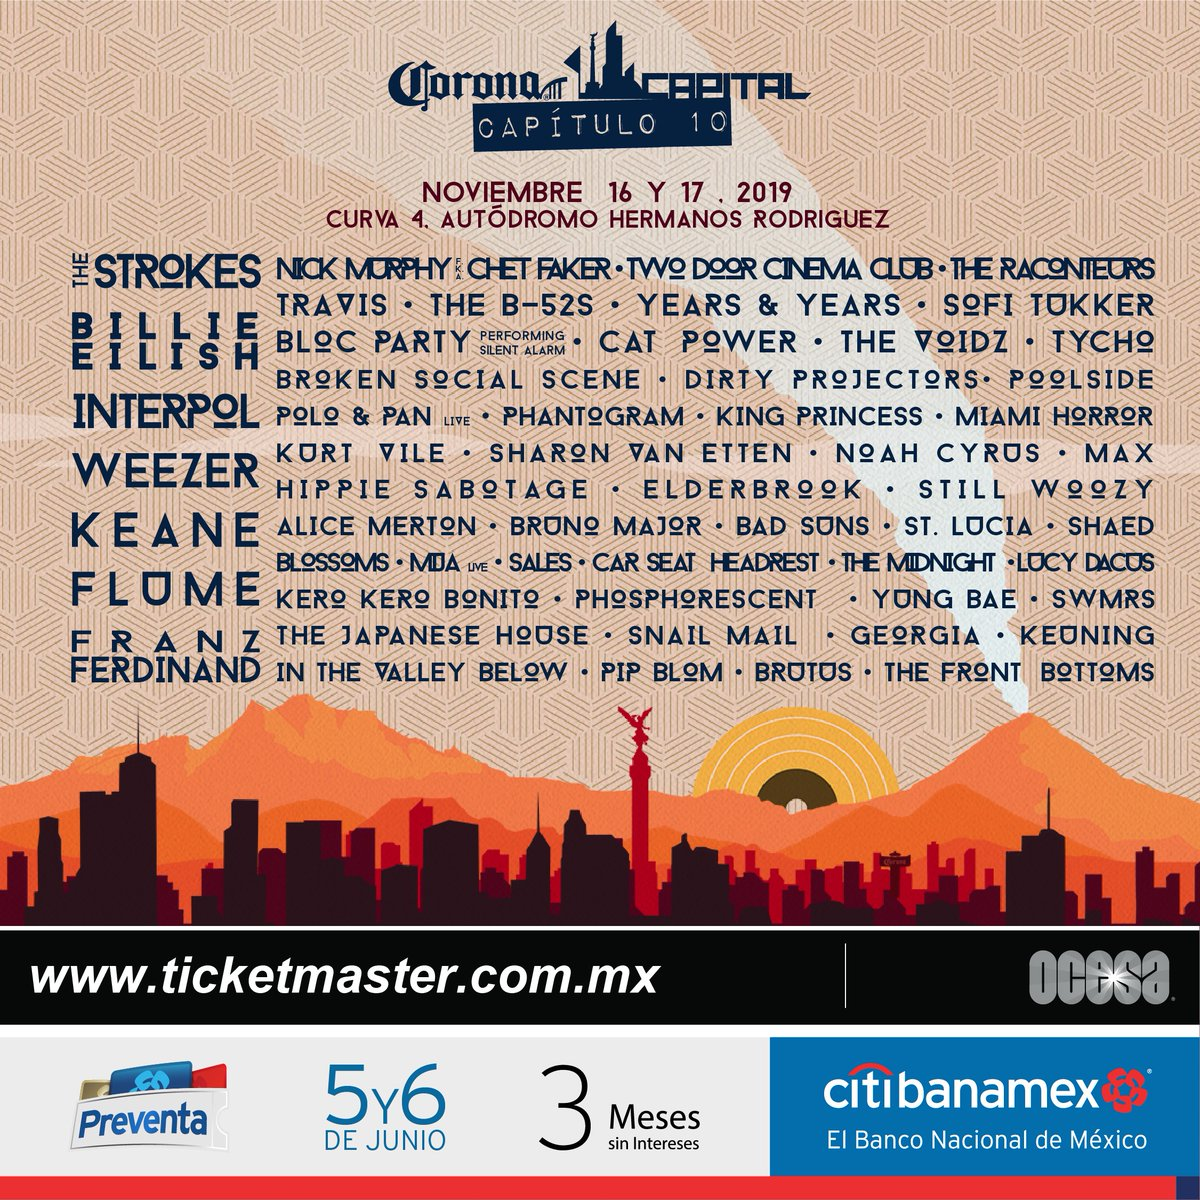 Coronacapital In Mexico Erdmusicpress Erpress Noticias News Festivales Shows Festival Broken Social Scene Autodromo Hermanos Rodriguez Festival Flyer